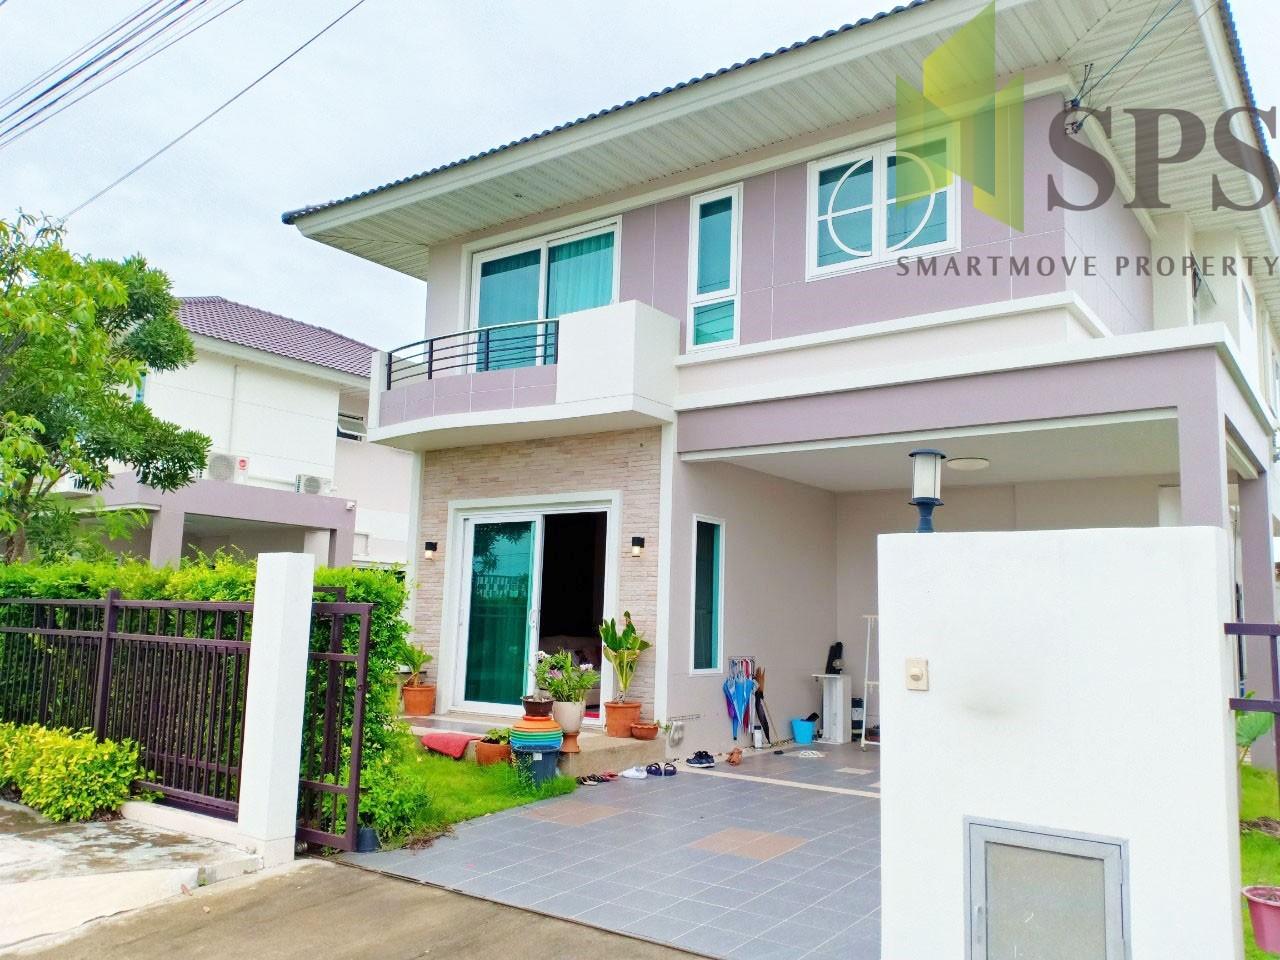 For Rent Single House Supalai Pride Bangna-Lat Krabang ให้เช่า บ้านเดี่ยว ศุภลัย ไพรด์ บางนา-ลาดกระบัง (Property ID: SPS-PA218)